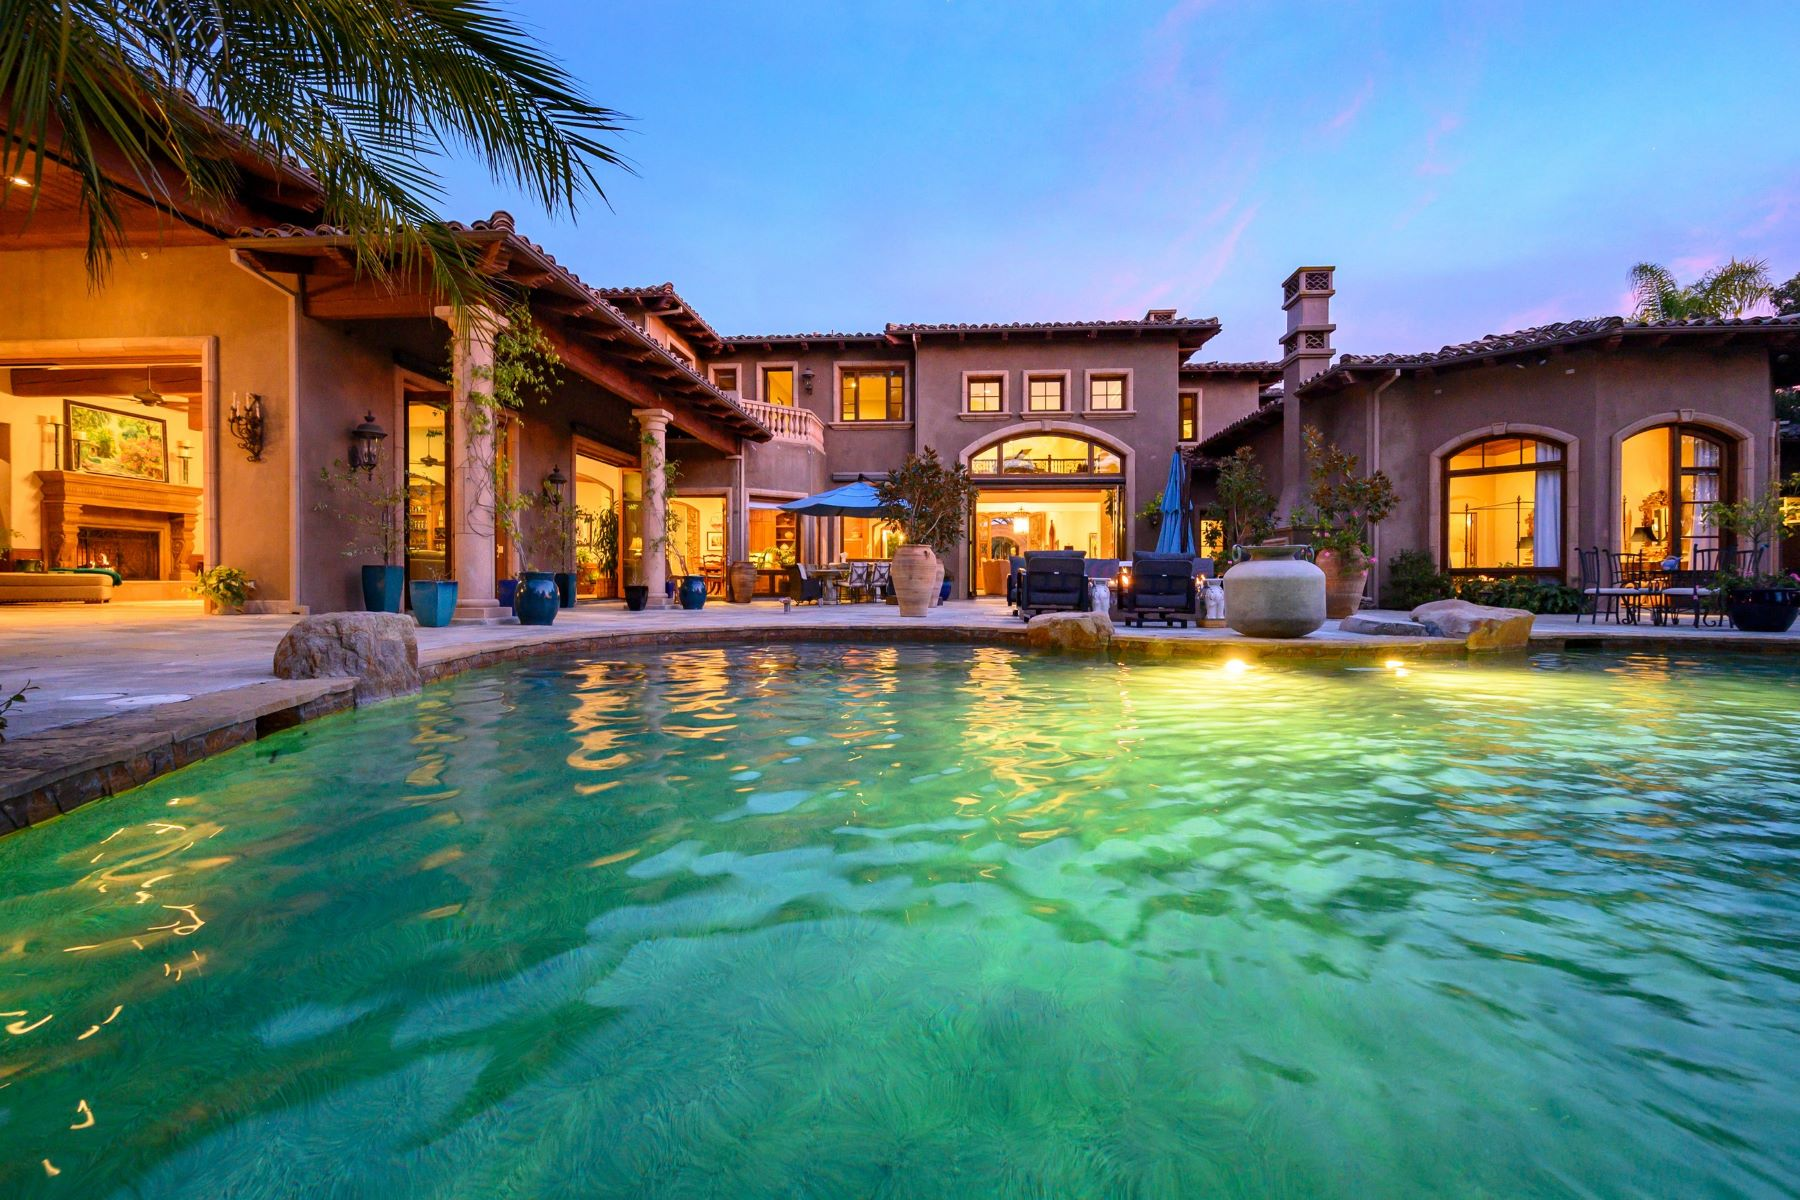 Single Family Homes for Sale at 17775 Calle Mayor Rancho Santa Fe, California 92067 United States